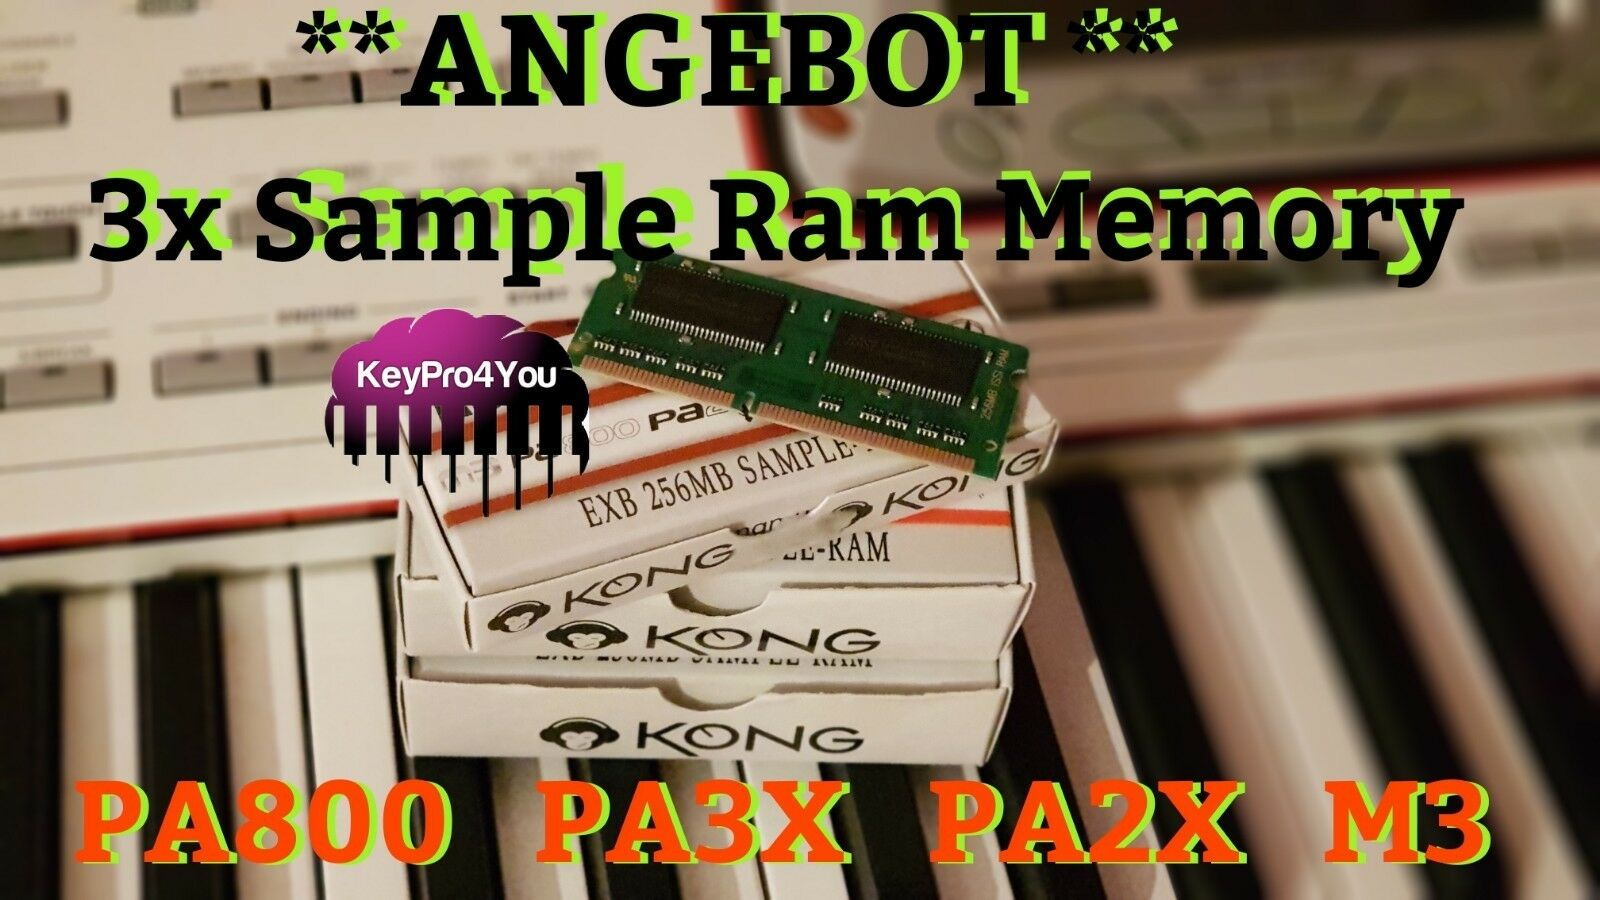 3x Korg Sample Ram Memory  pa800 pa2x pa3x m3 Keyboard Speichererwieterung TOP